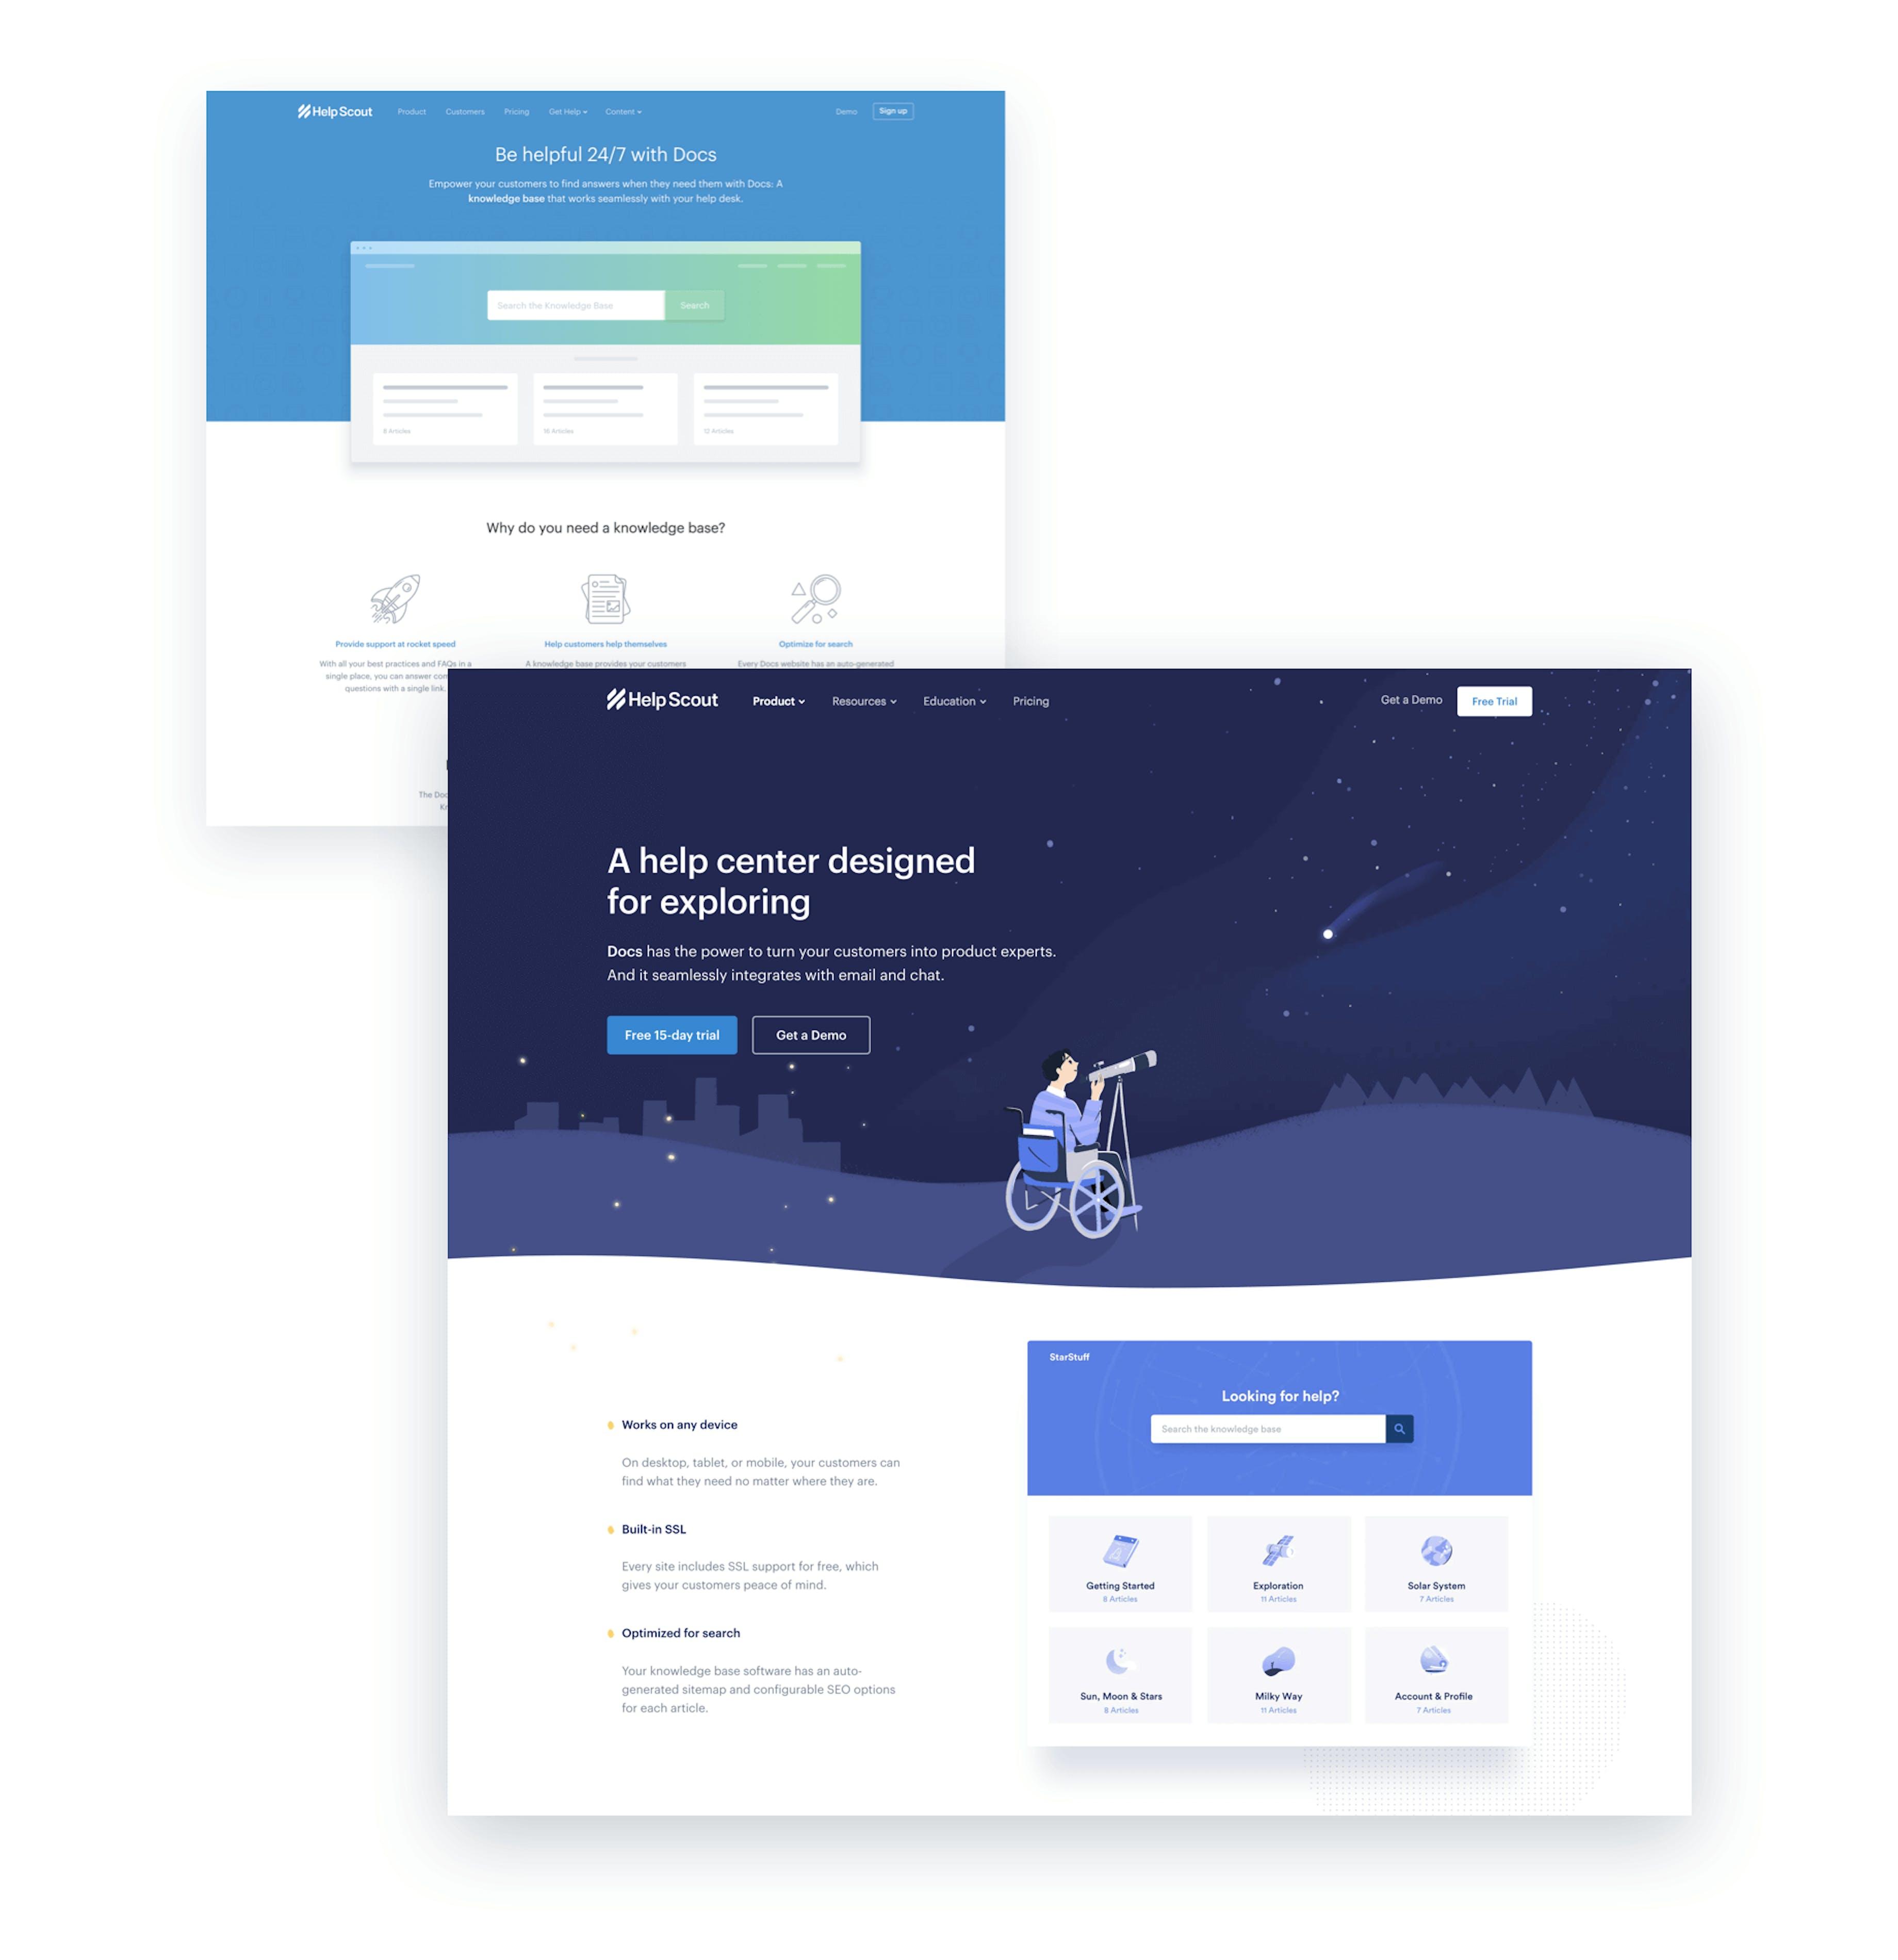 knowledge base page comparison